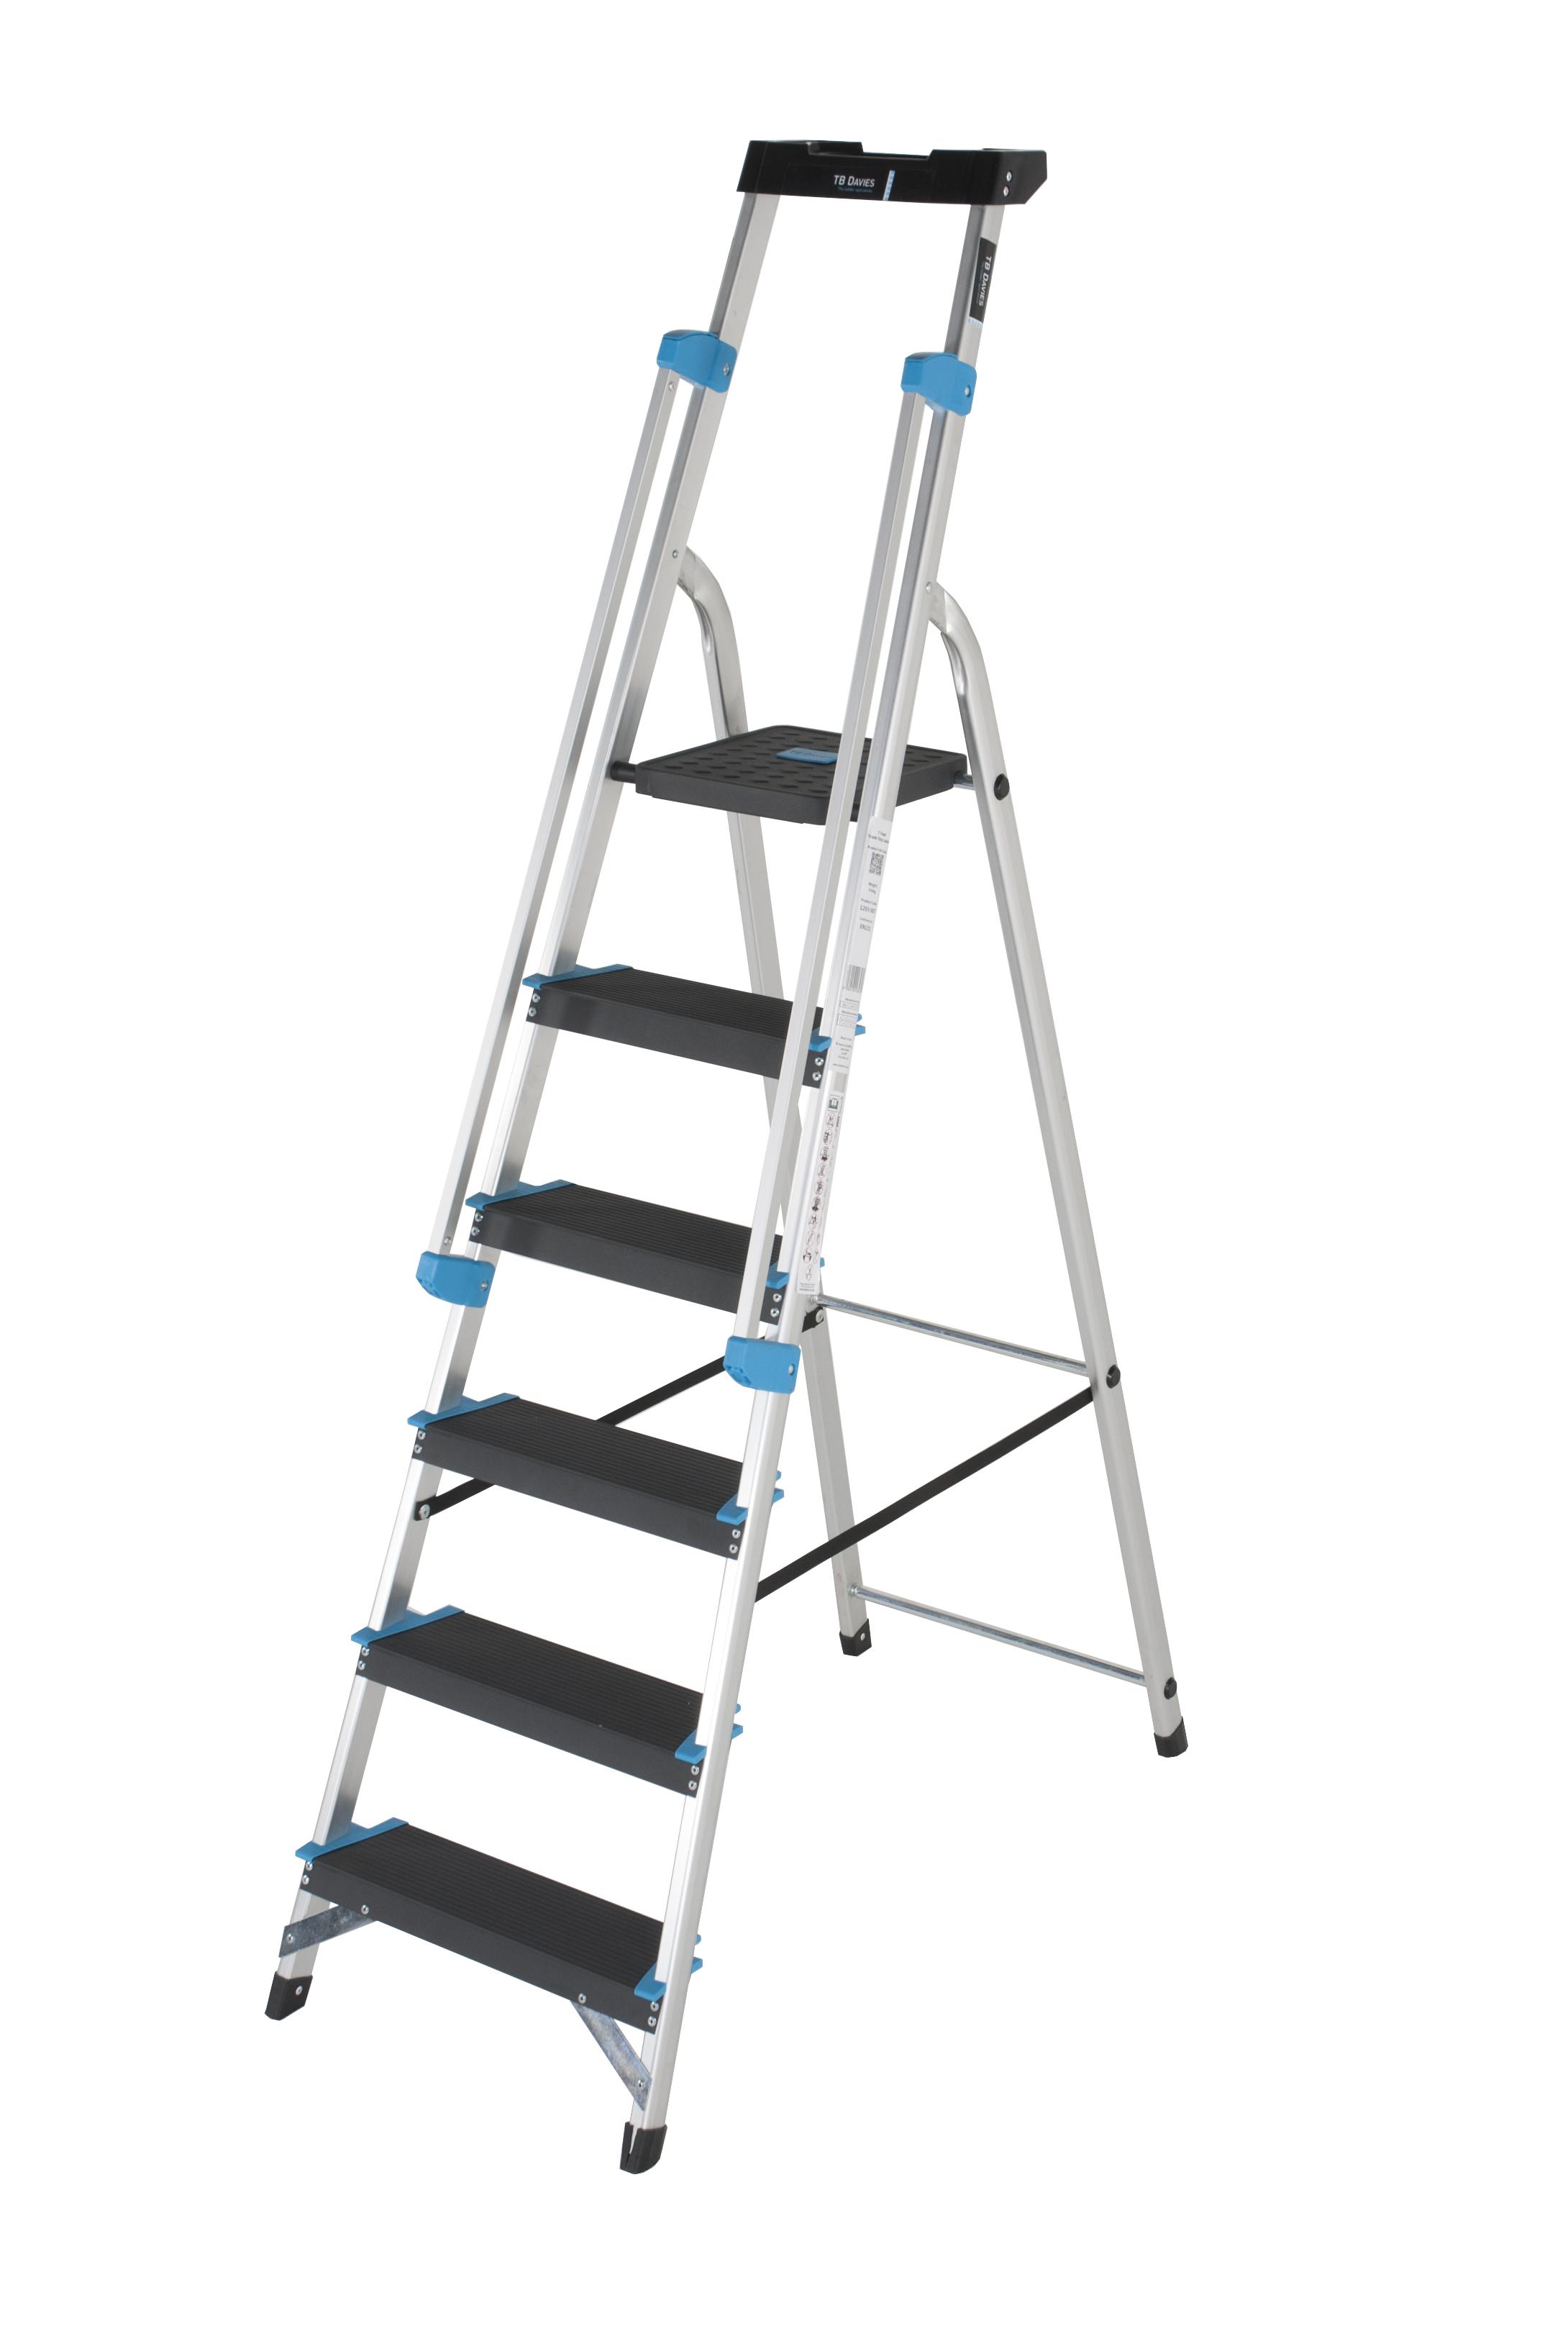 6 Tread Professional Platform Step With Handrails